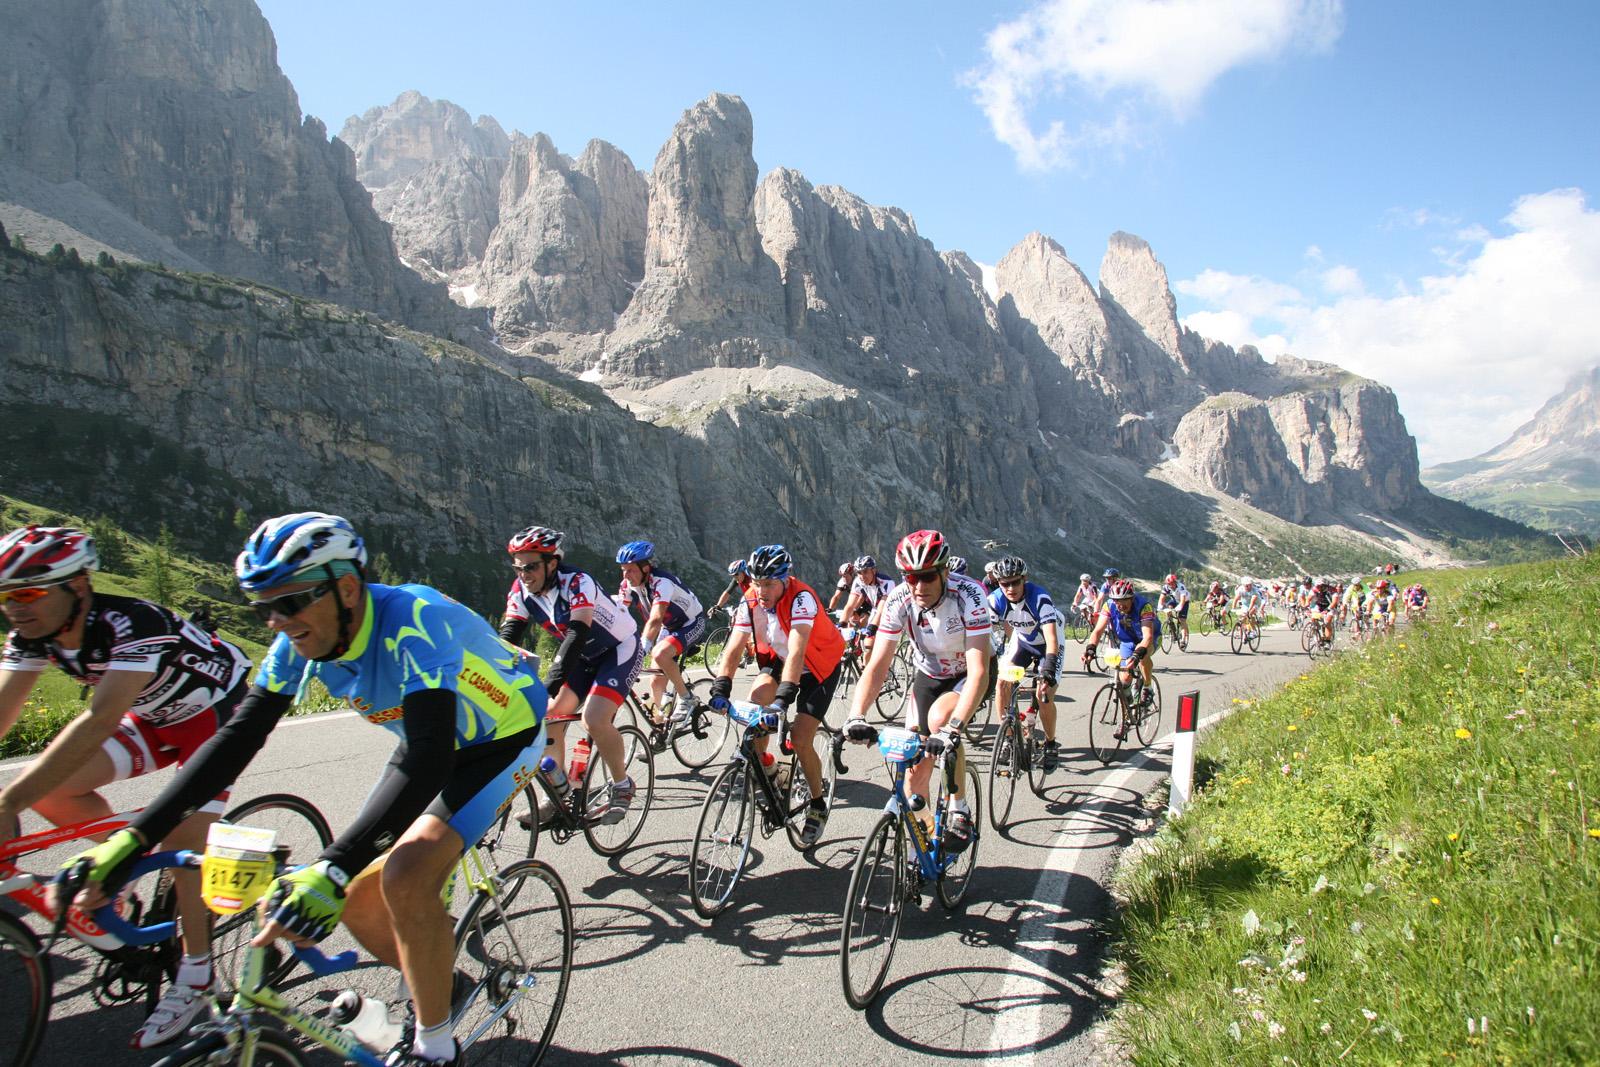 Cyclosportive Calendrier.Cyclosport Calendrier Complet De La Saison 2019 Bike